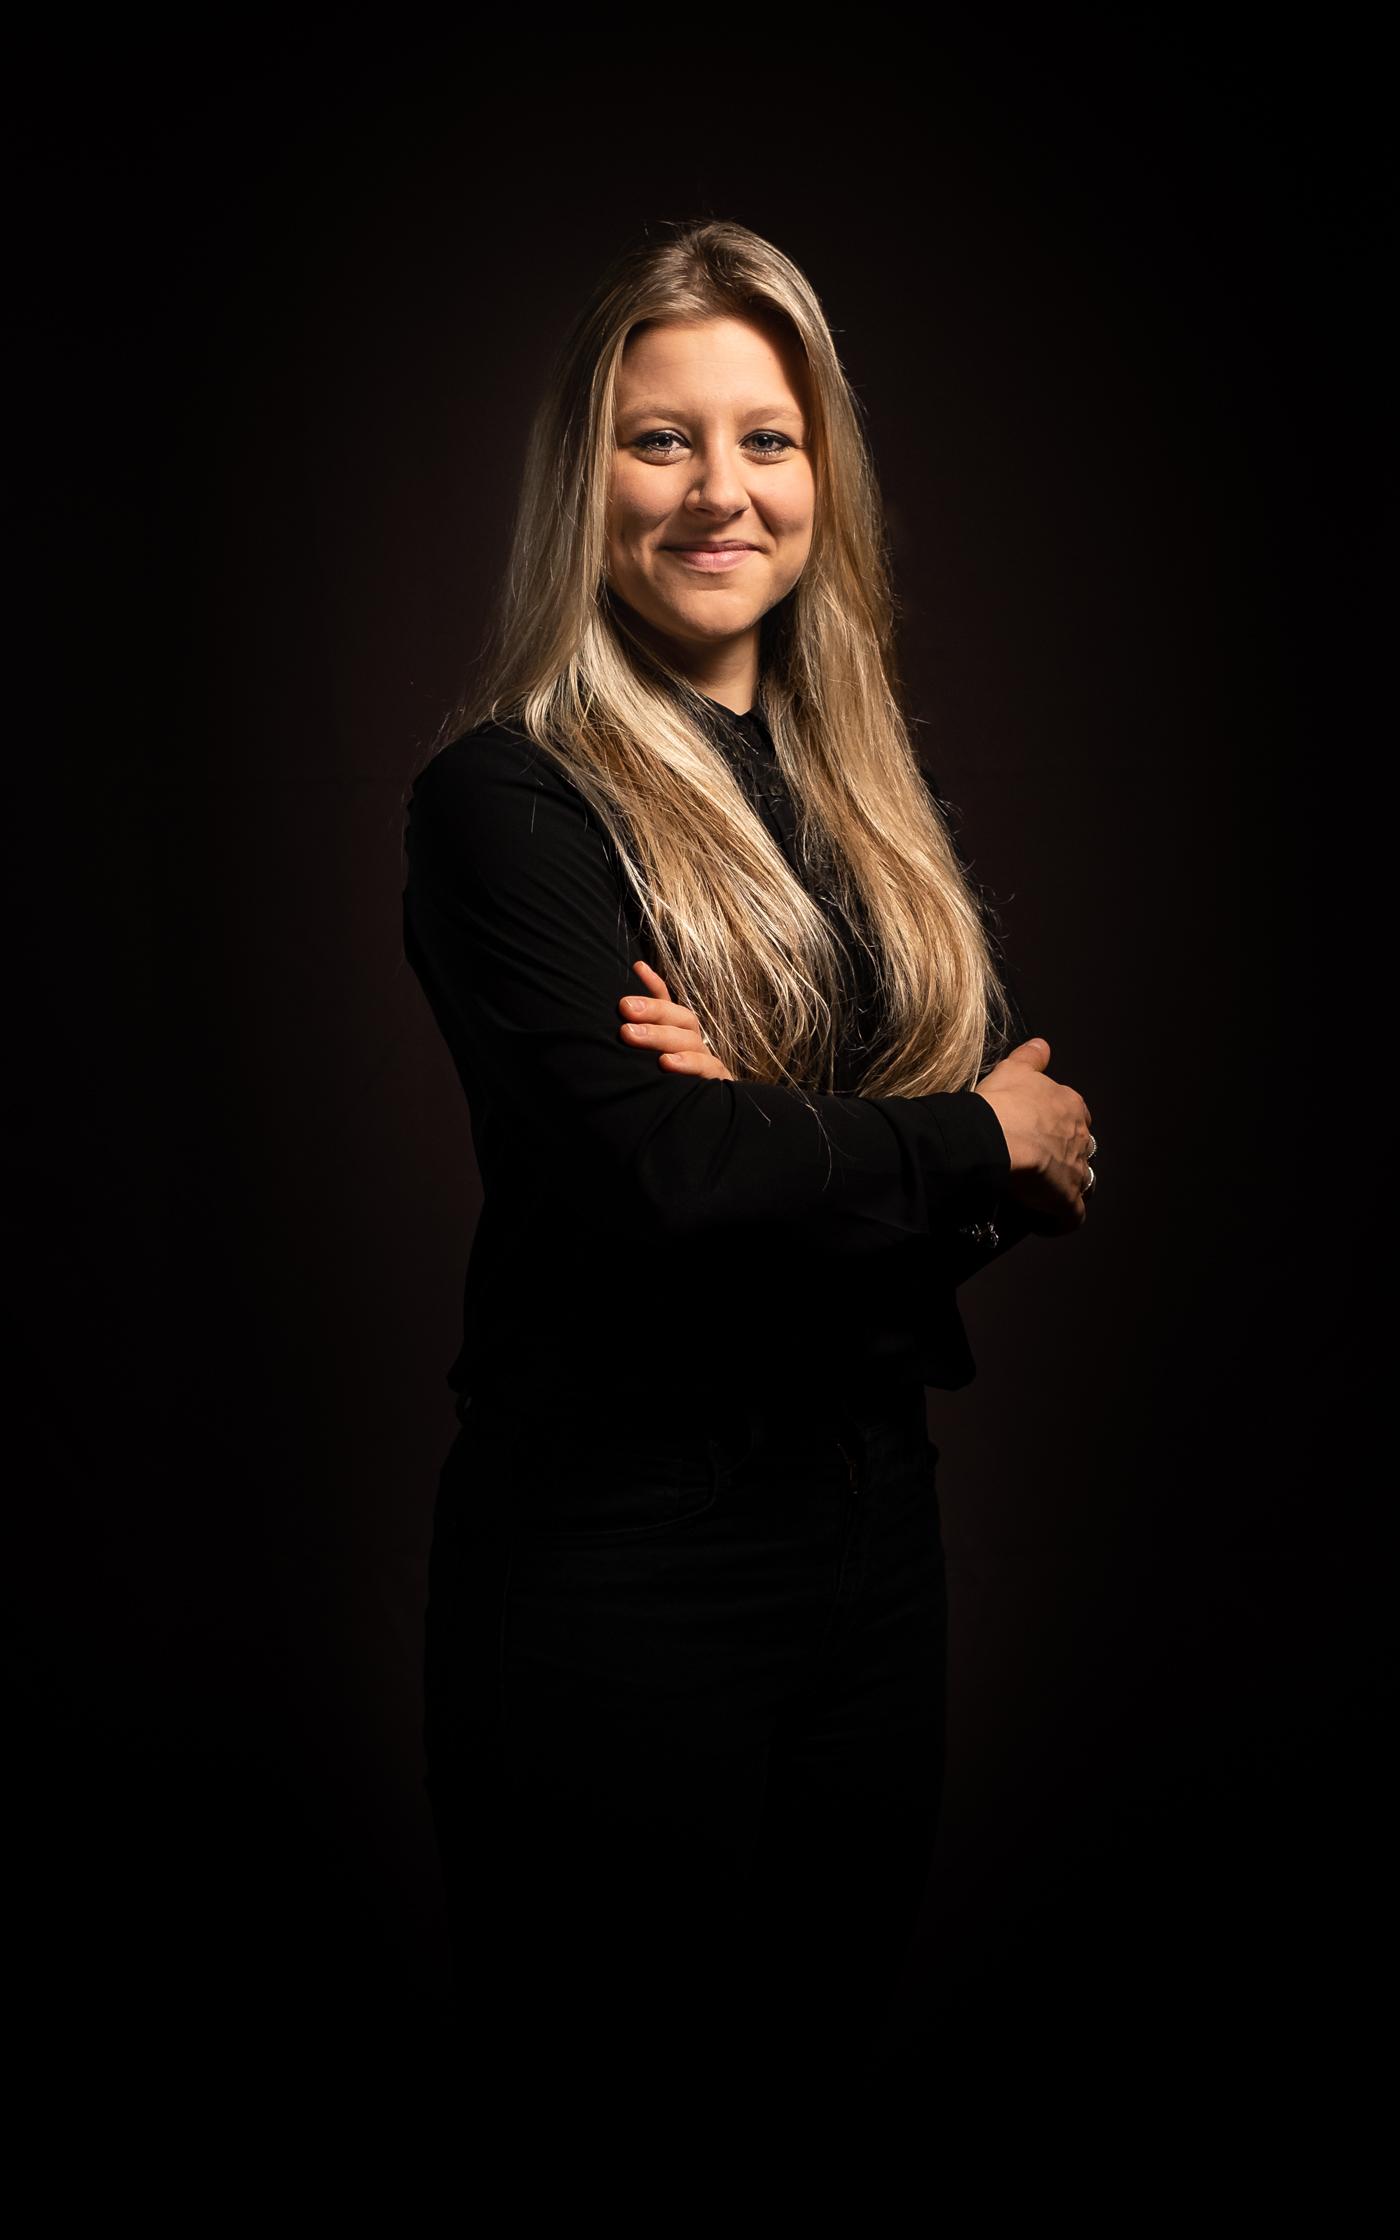 Marie Nicolet